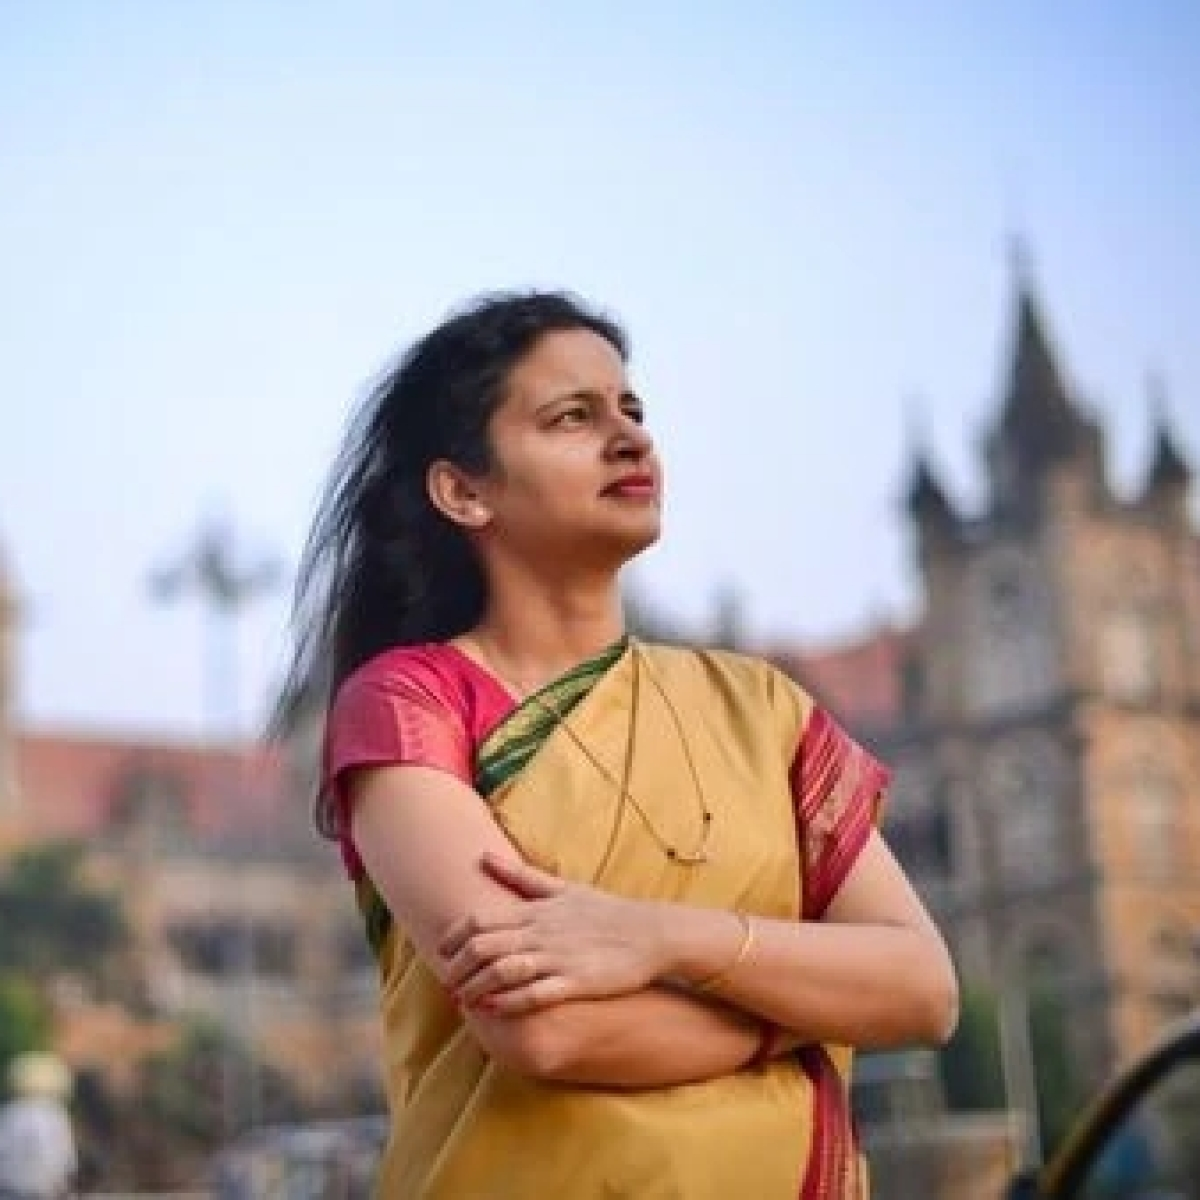 26 eleven: Daughter releases book on Hemant Karkare